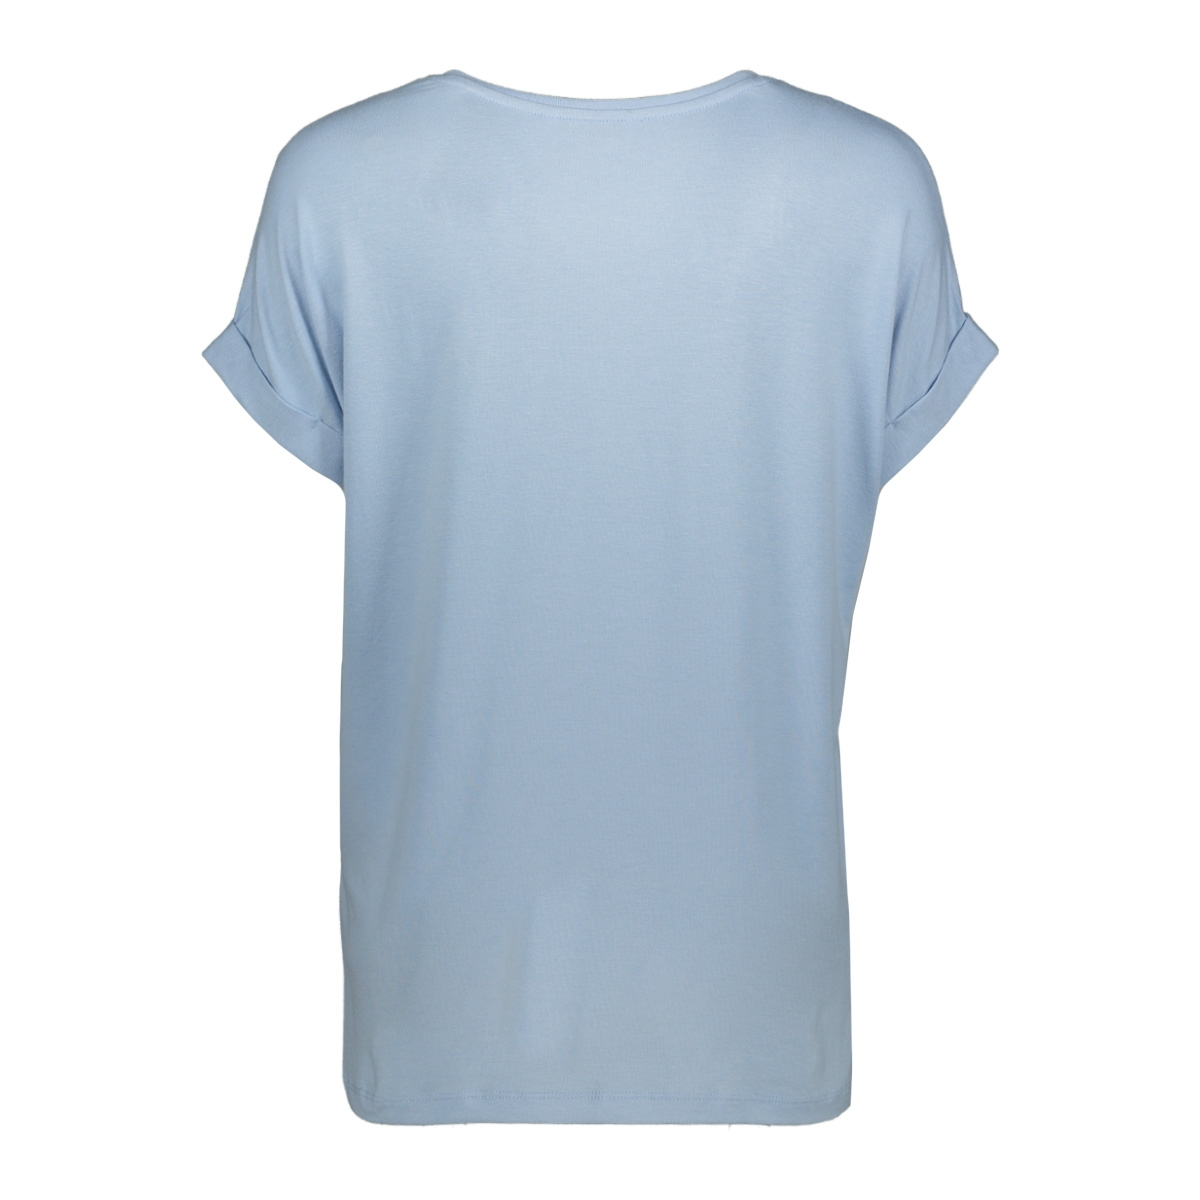 onlmoster s/s o-neck top noos jrs 15106662 only t-shirt cashmere blue